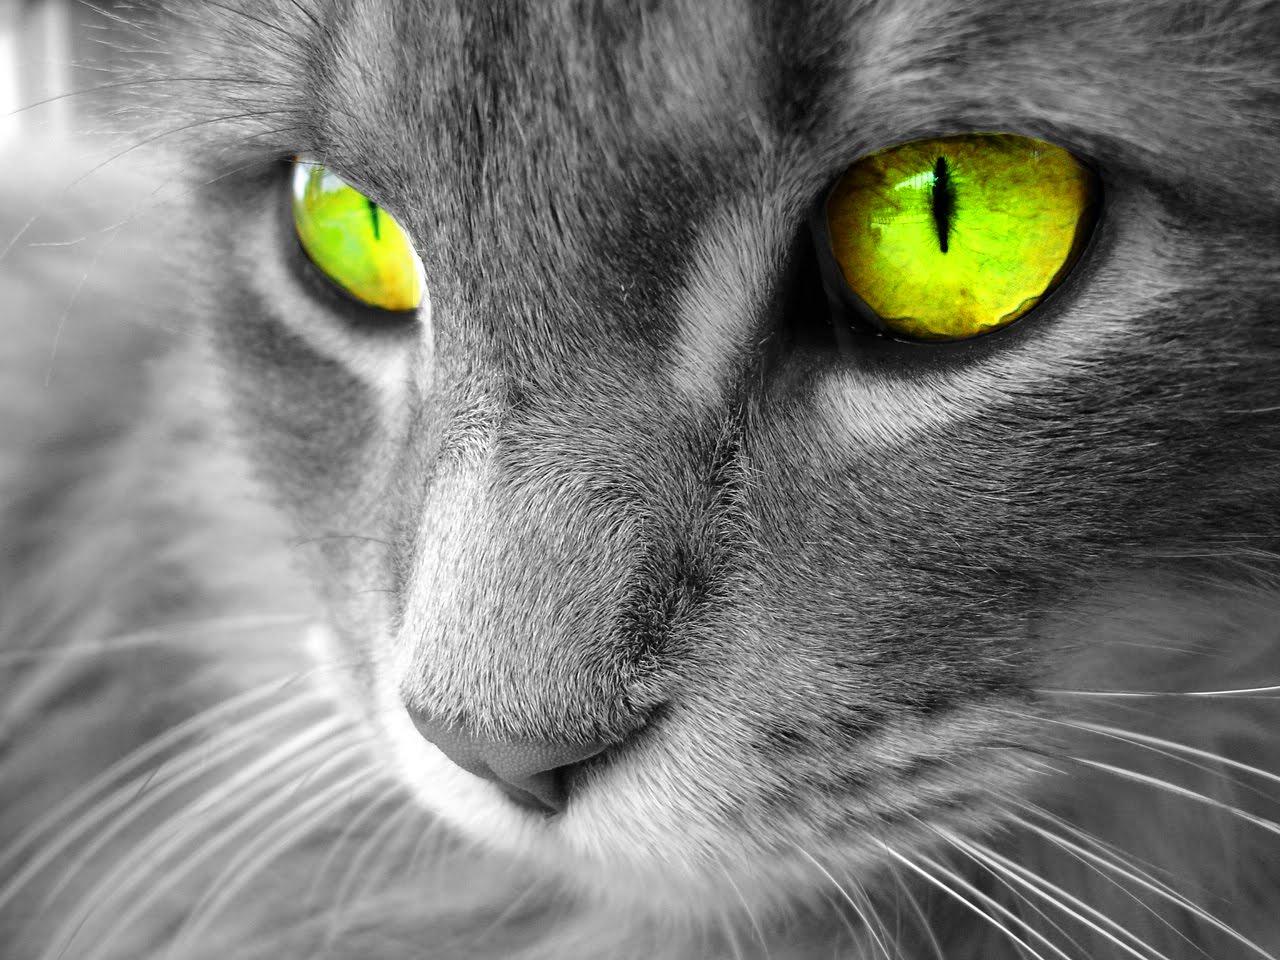 http://2.bp.blogspot.com/-GVlQH_wYT_k/T9N-ZpmnbnI/AAAAAAAAAGM/WJRamhtrzLc/s1600/gato+ojos+verdes+wallpaper+animales.jpg